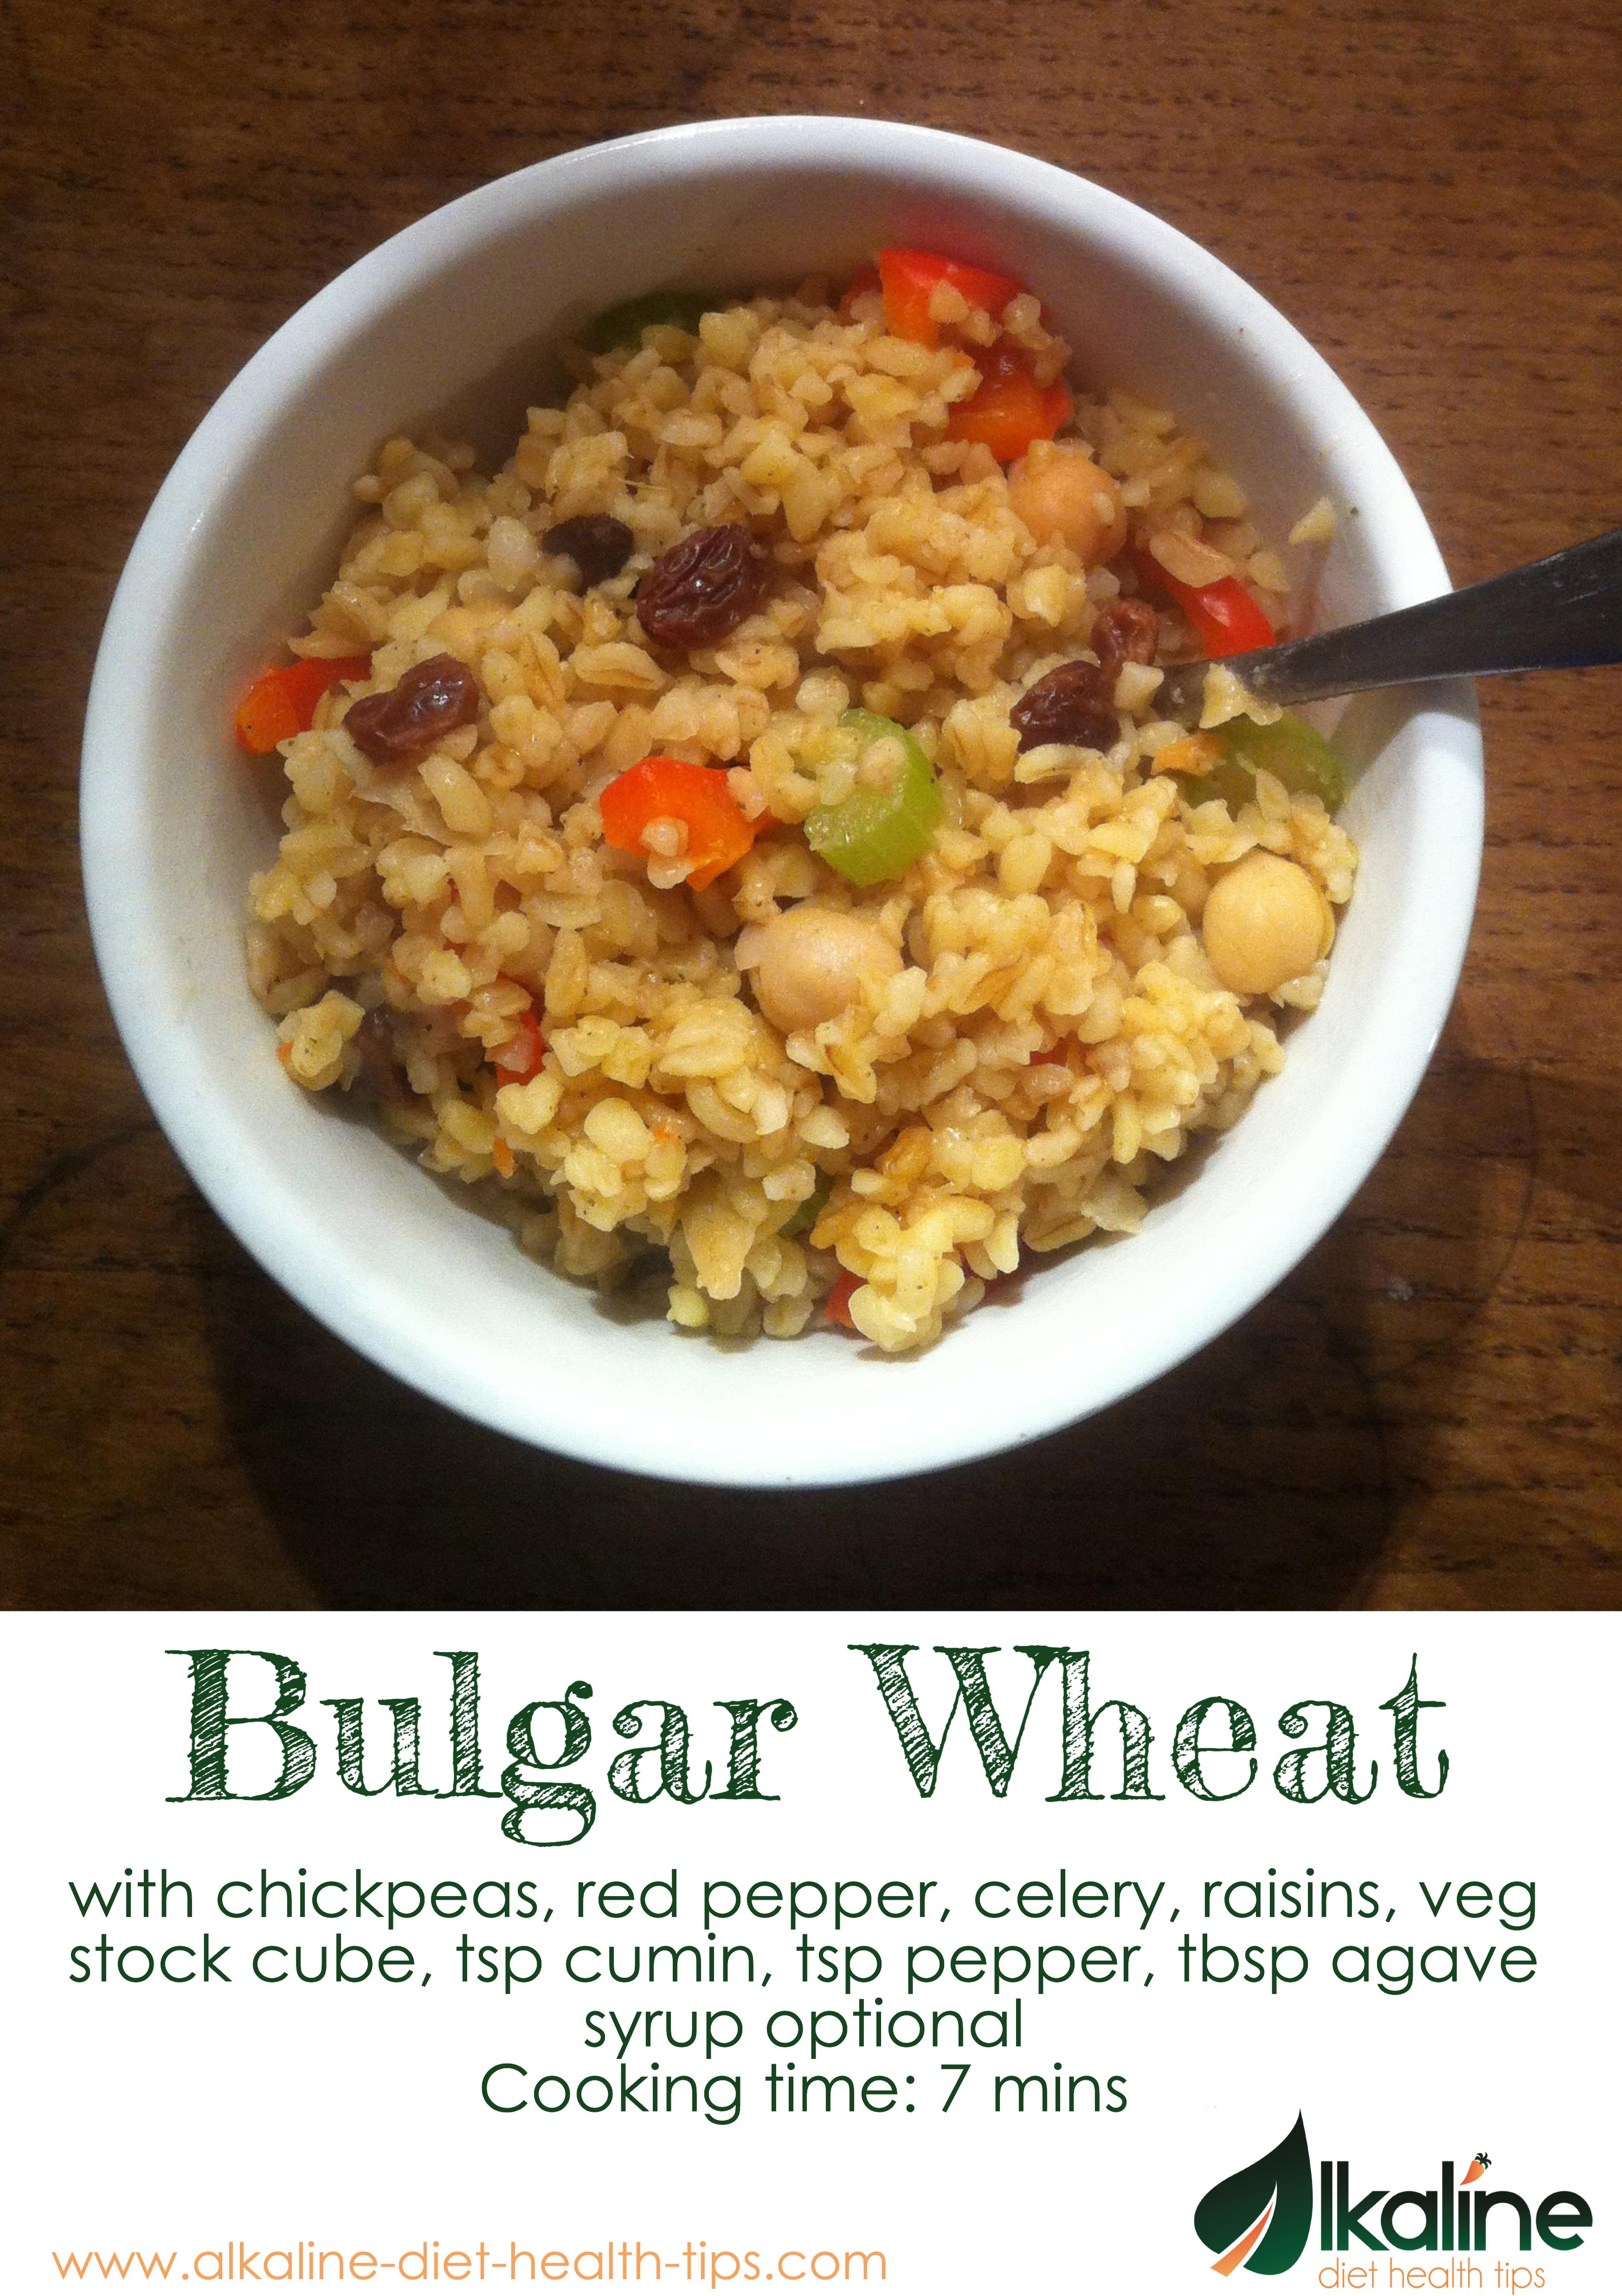 ... diet/bonuses/Alkaline-5-Diet-Recipes-Bulgar-Wheat-Raisins.jpg